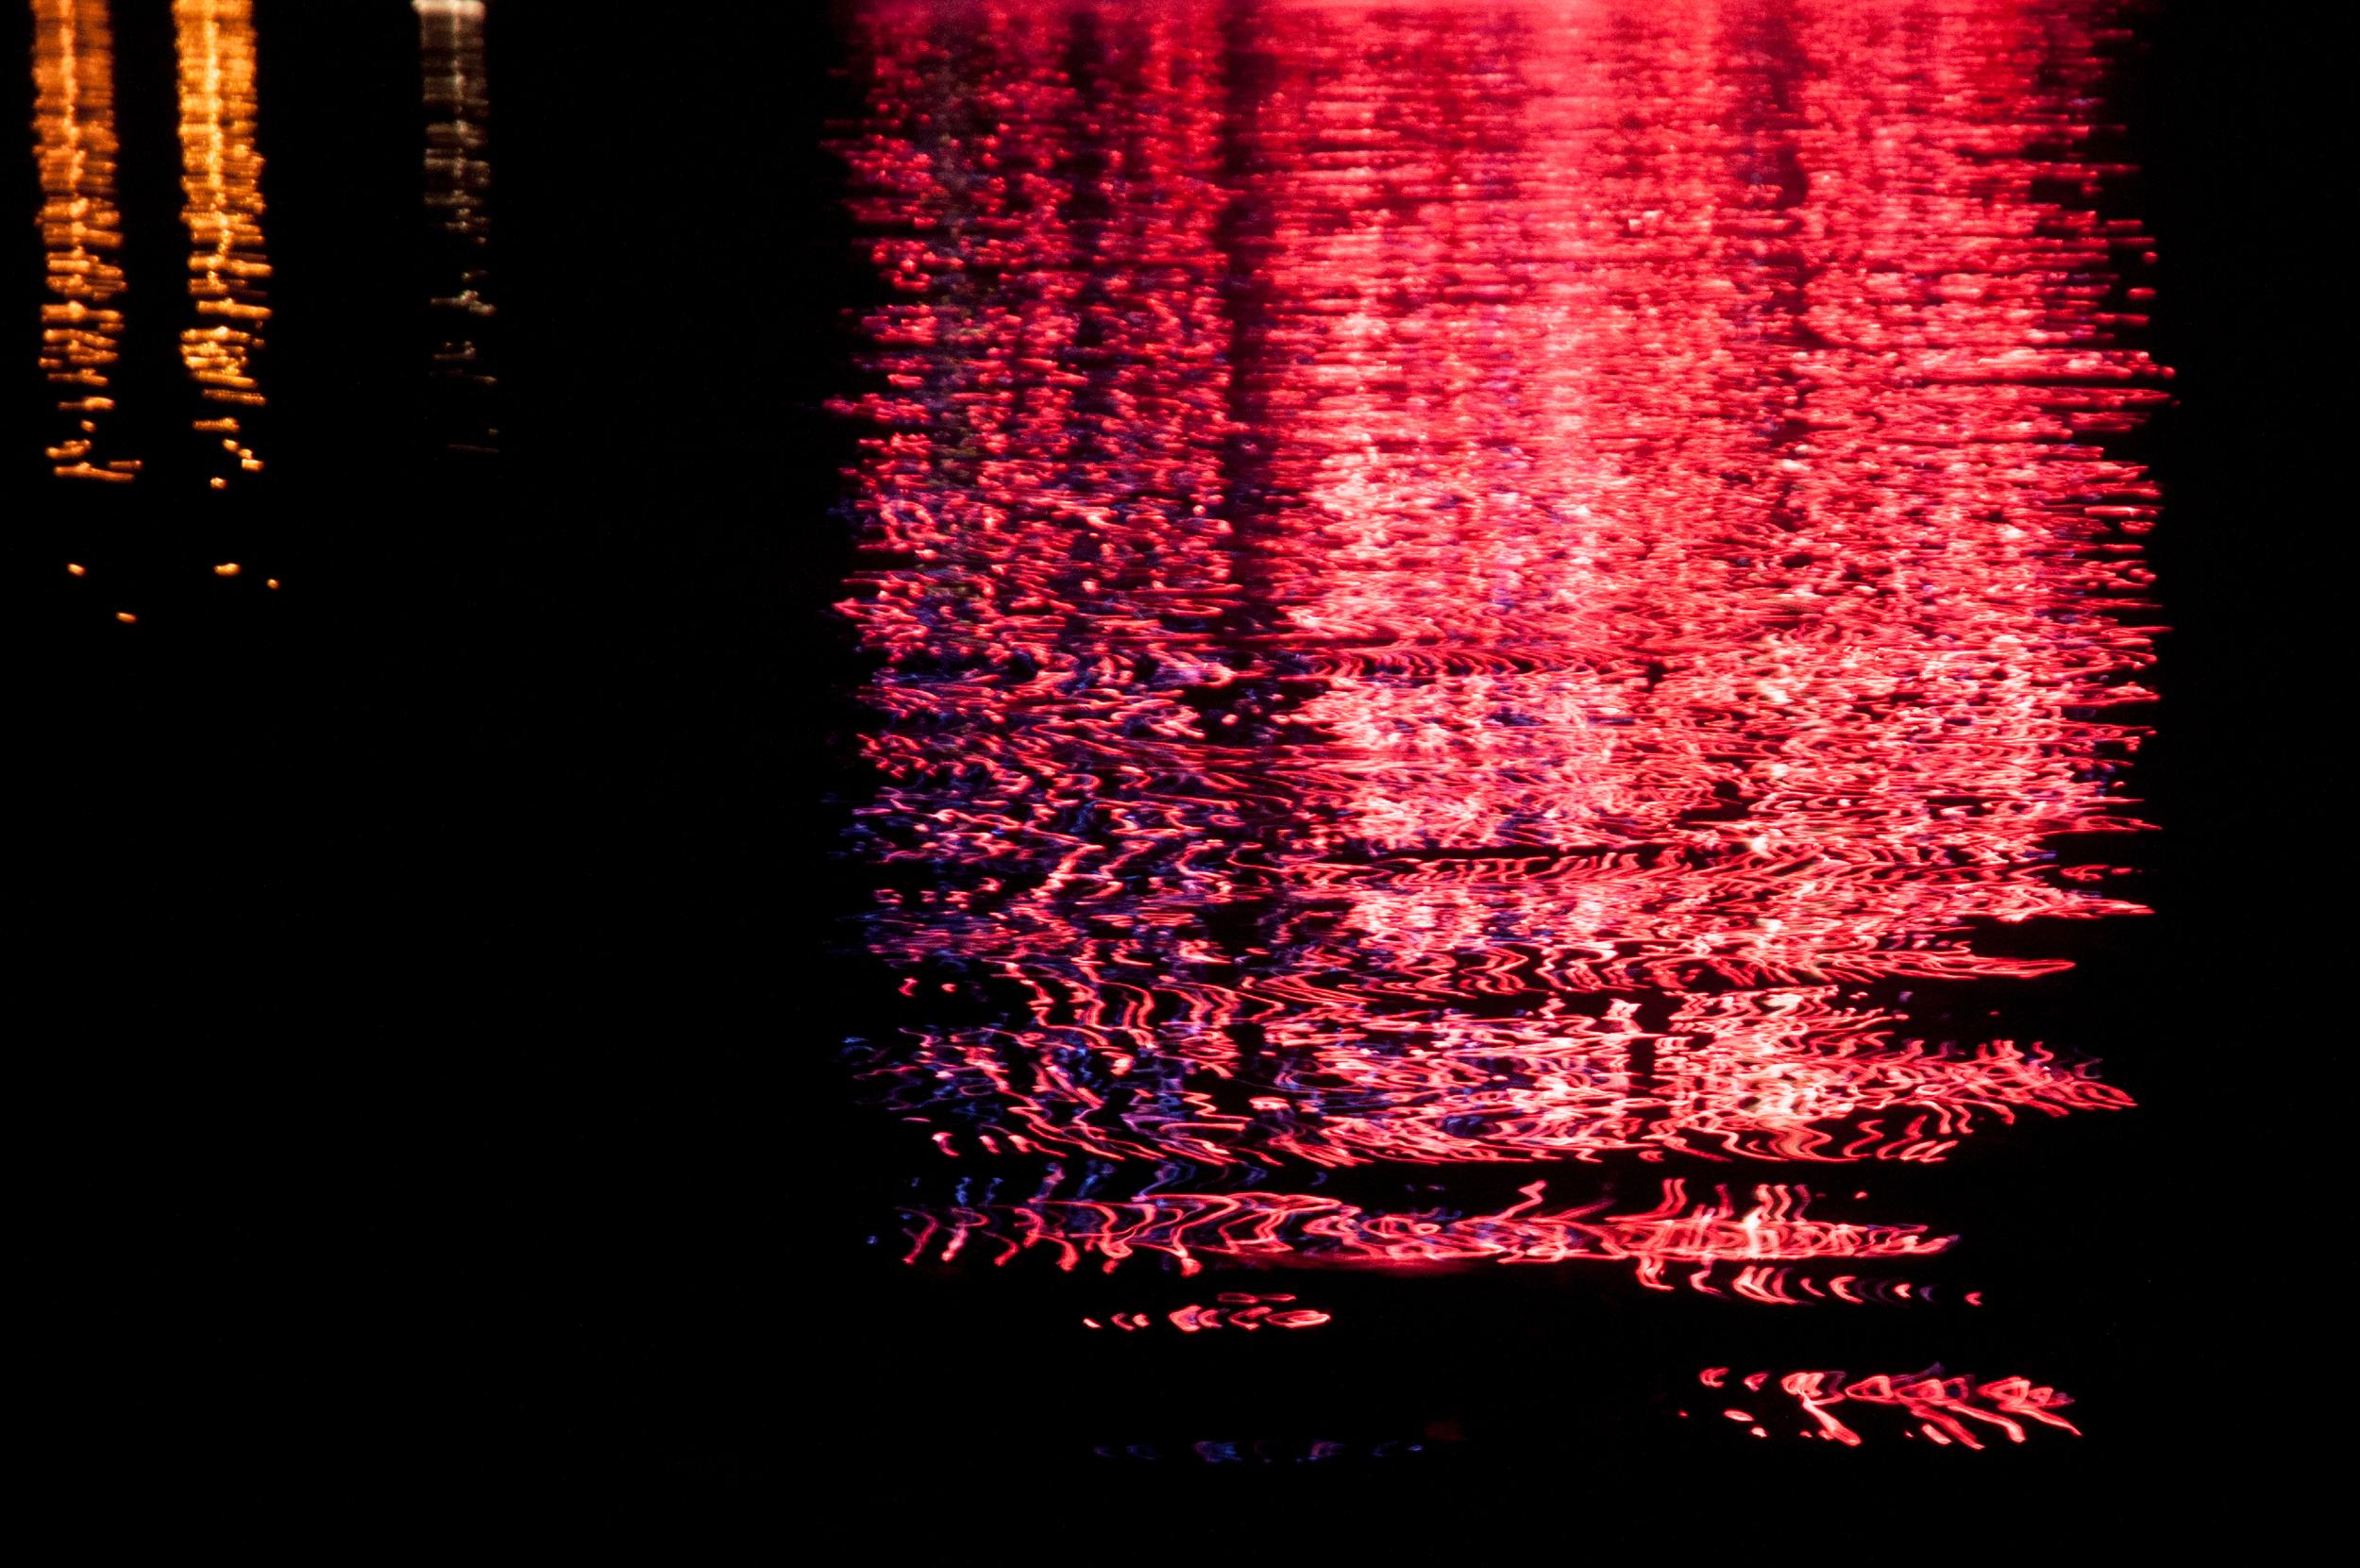 ReflectionsFireworks_1095.jpg